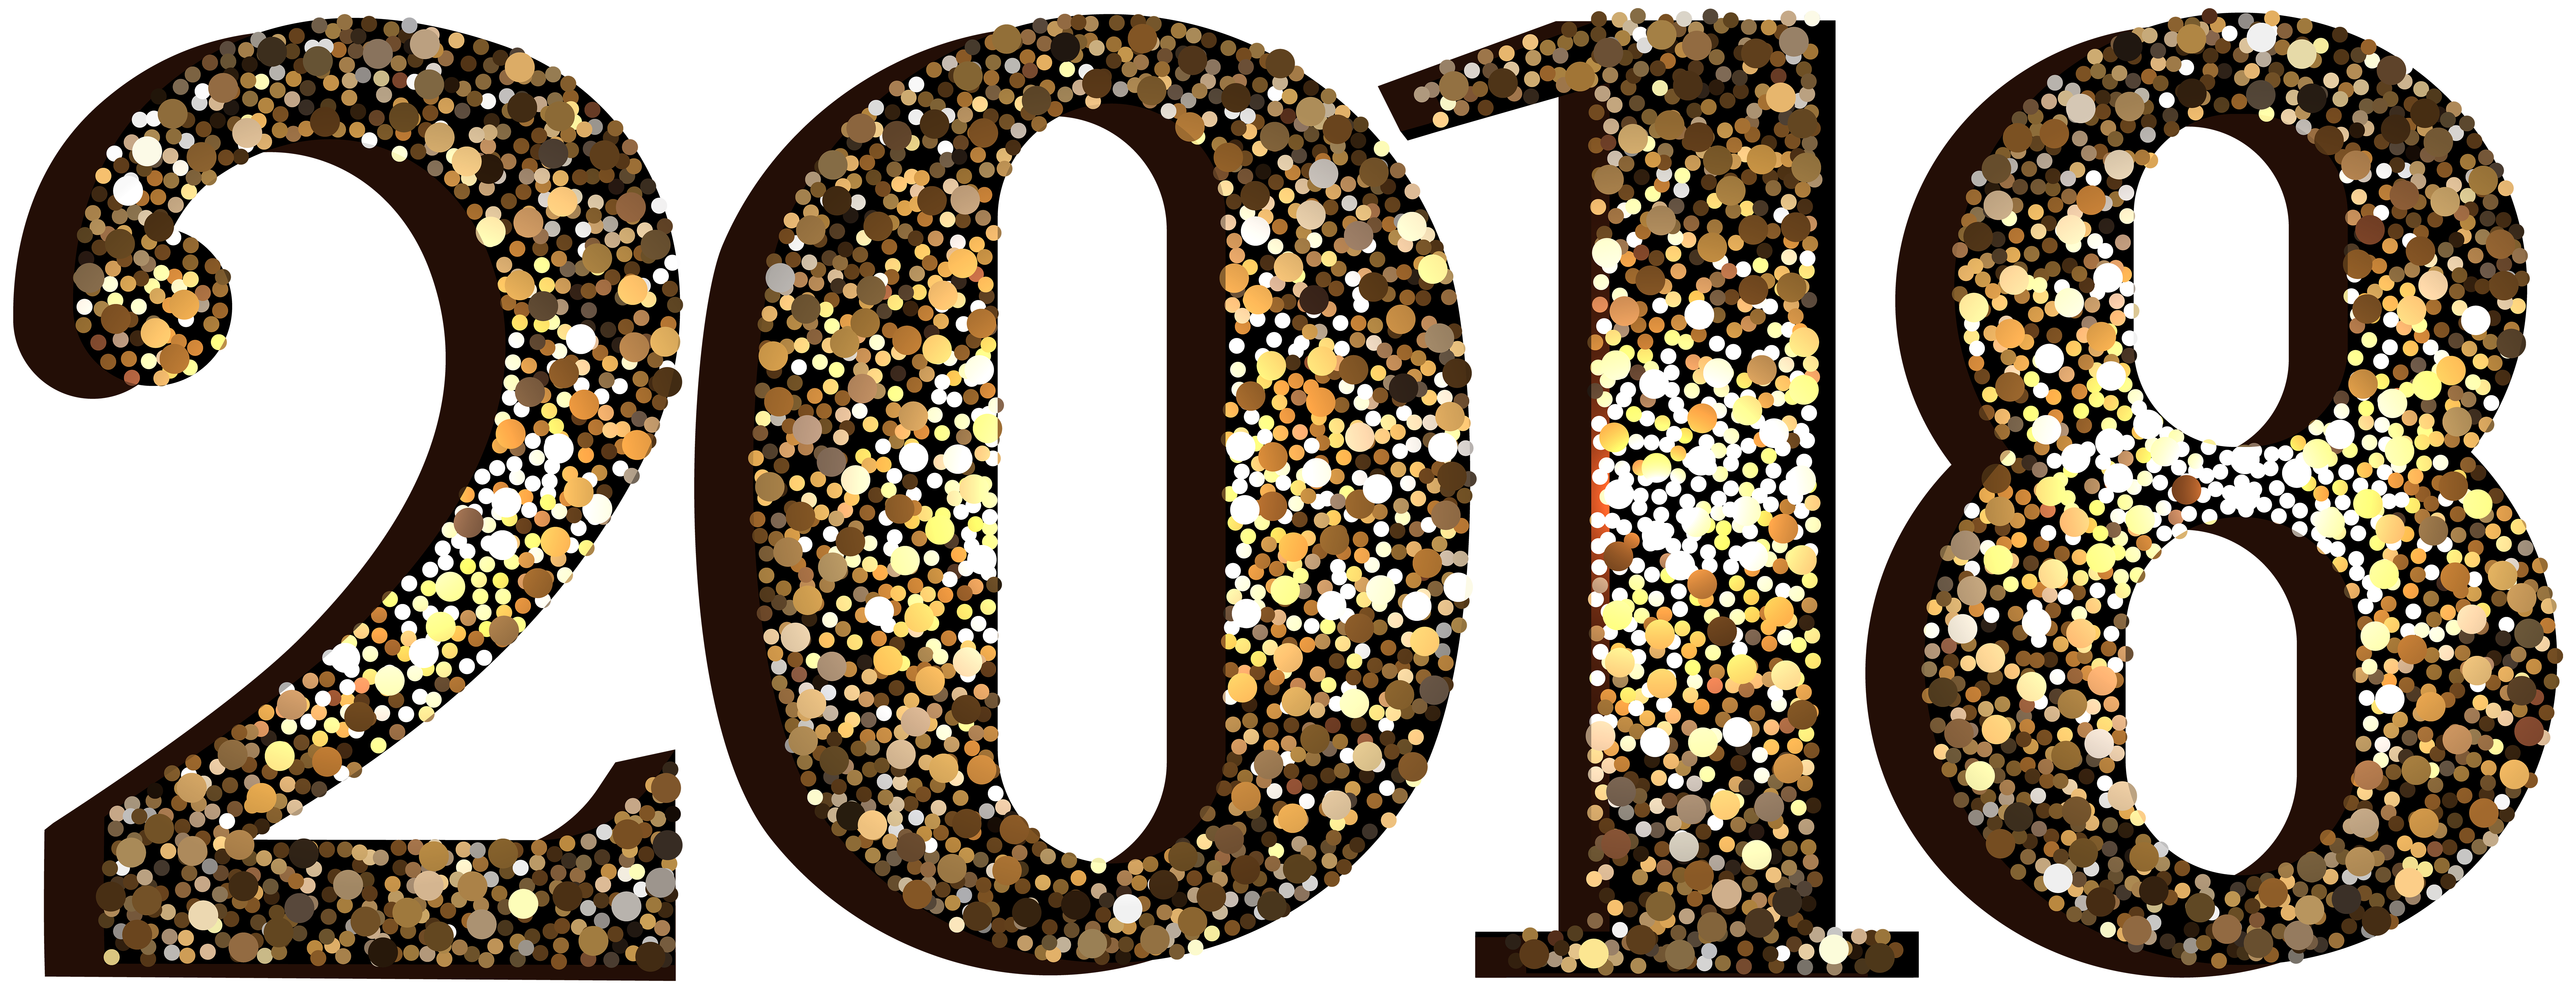 2018 Decorative Transparent Clip Art Image.